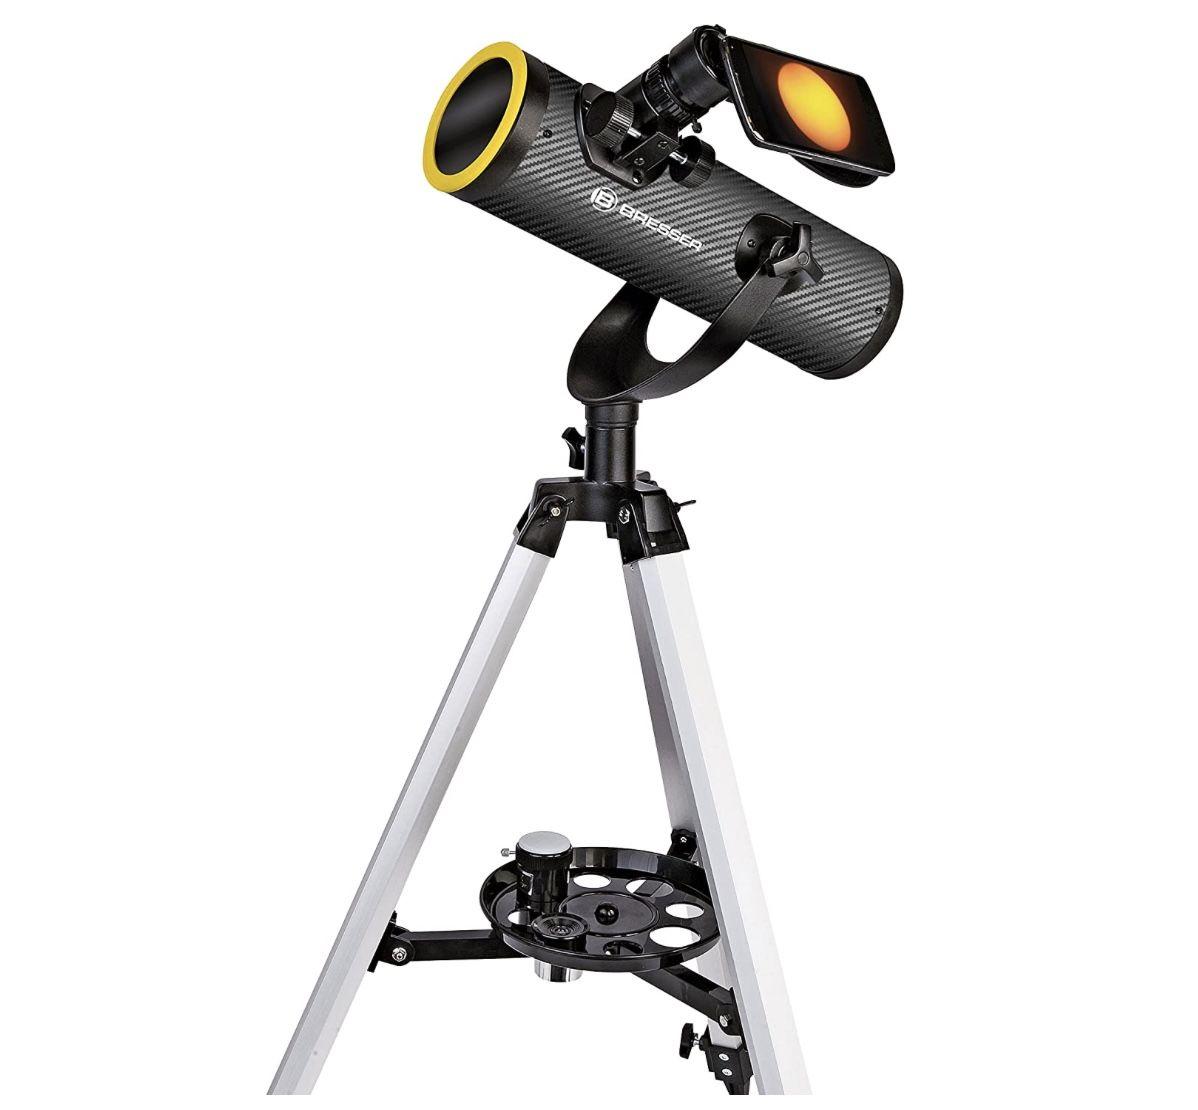 Bresser Teleskop Solarix AZ 76/350 mit Stativ für 60,22€ (statt 76€)